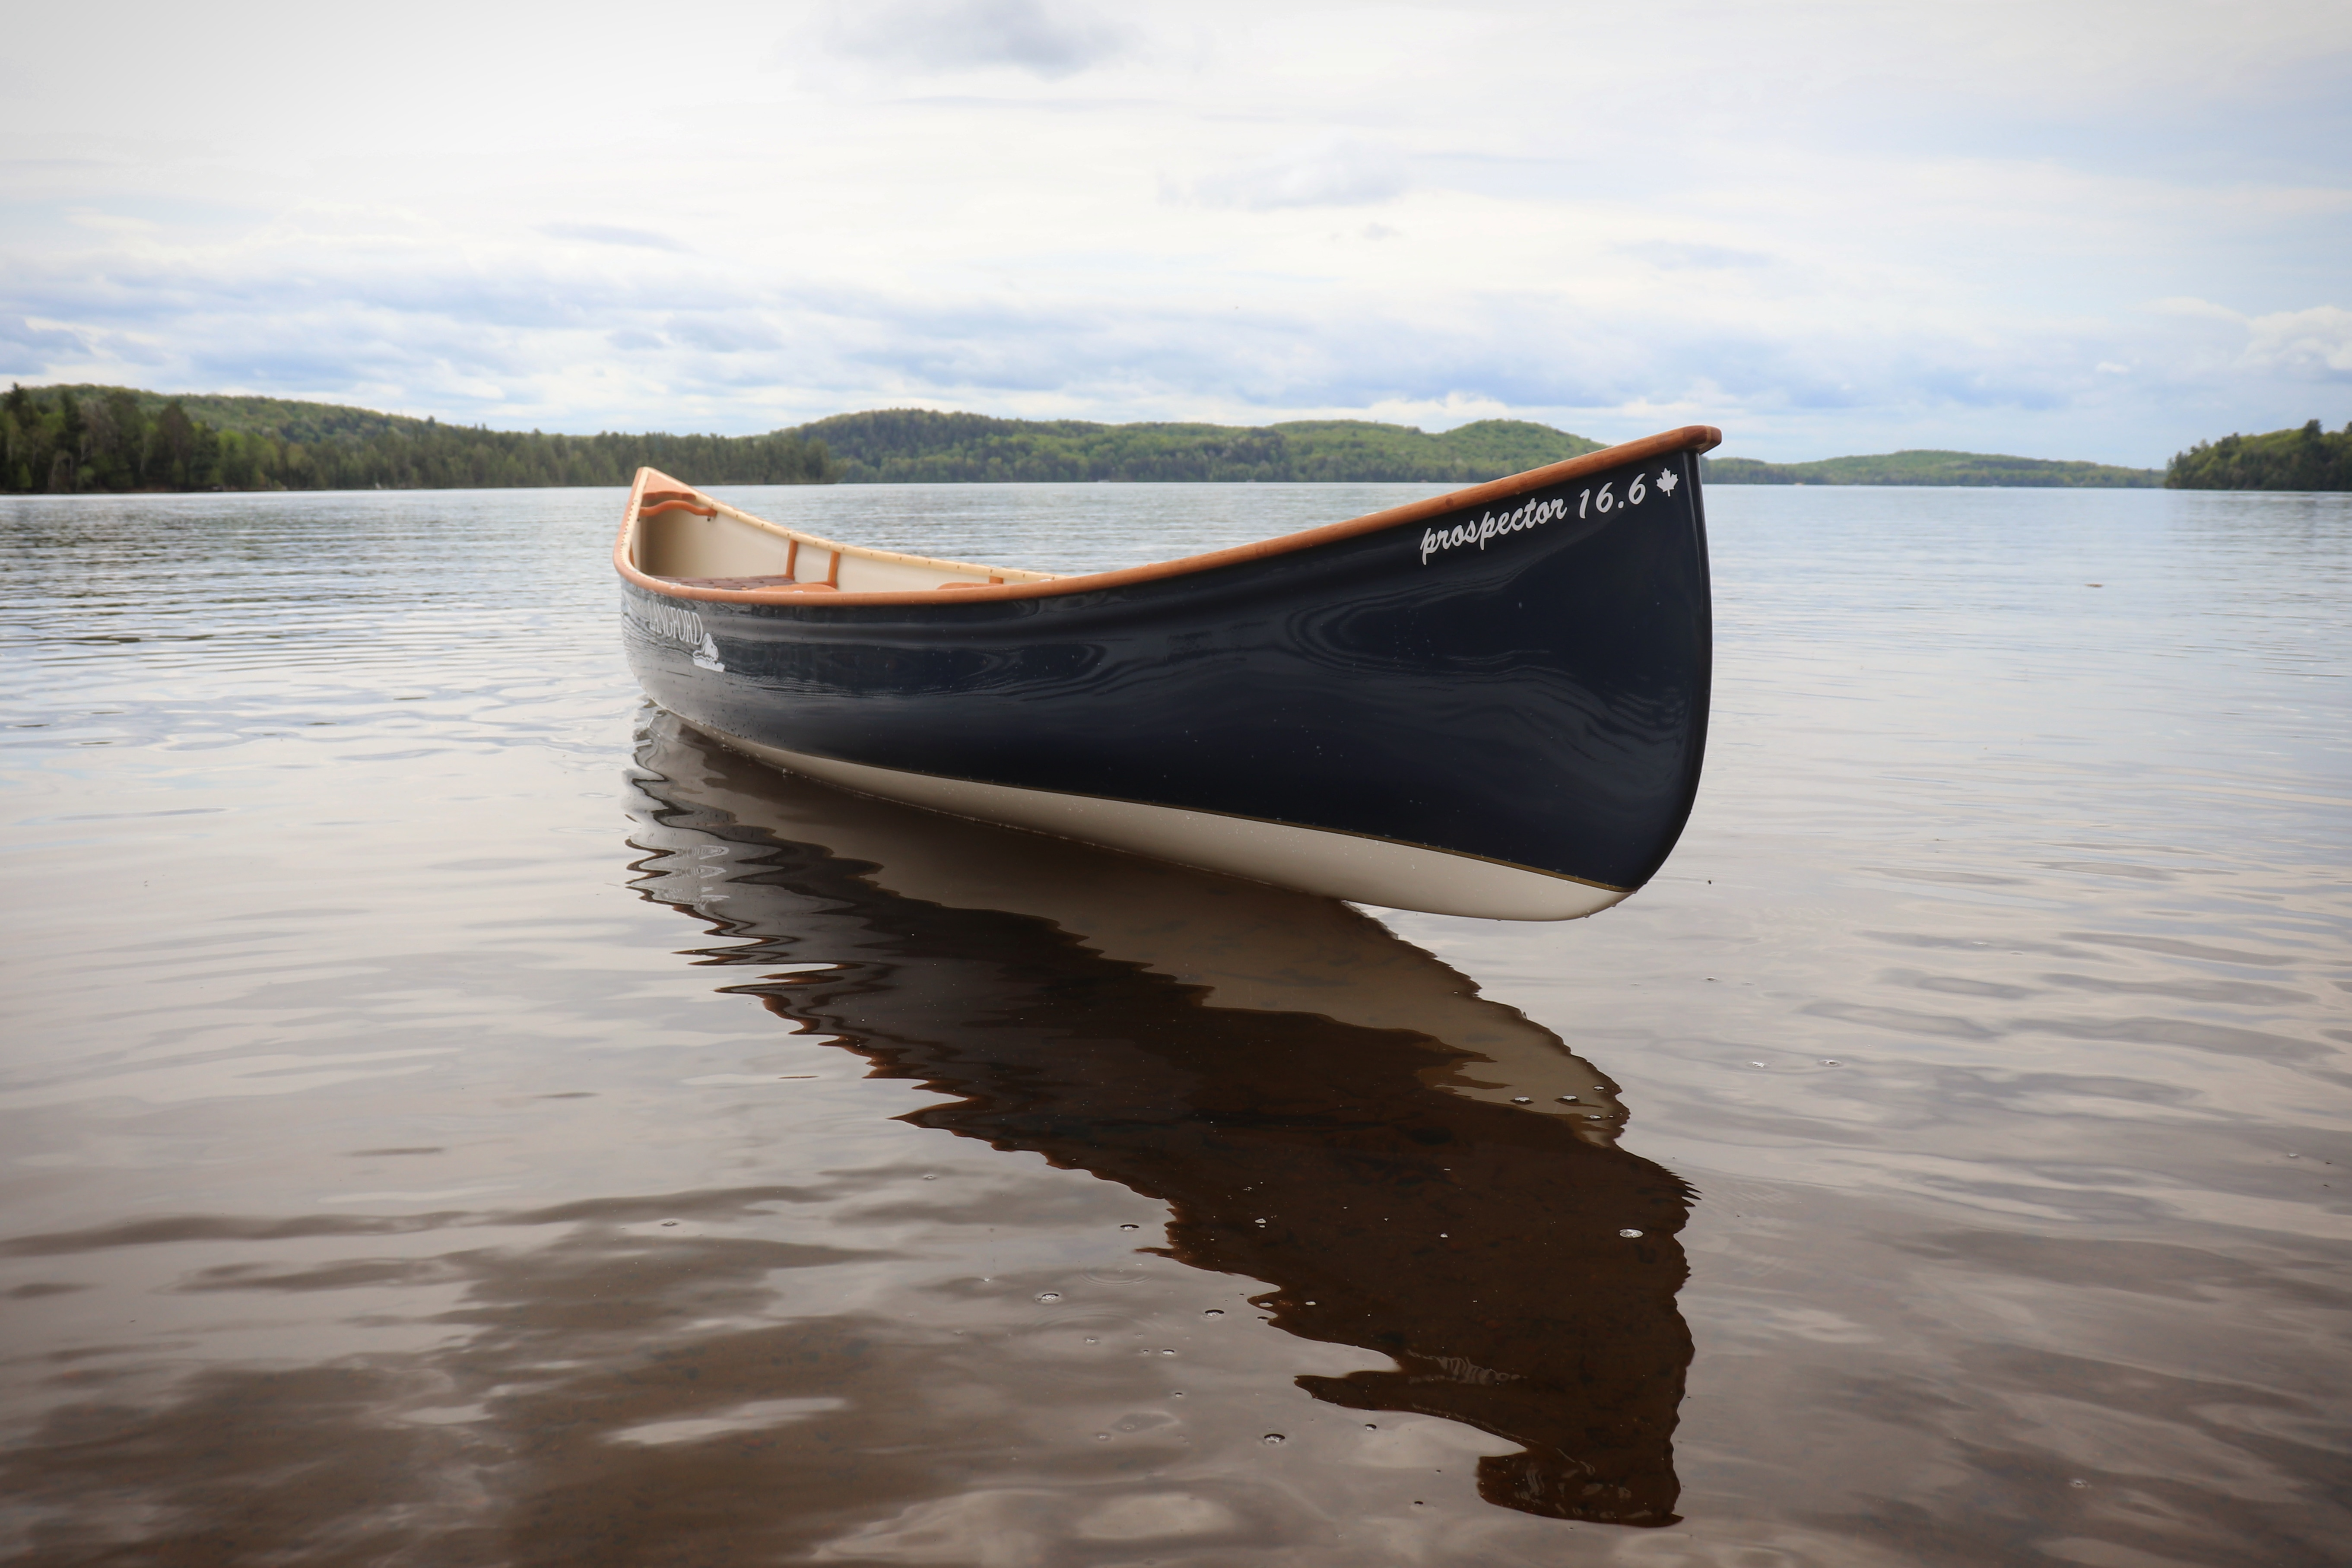 Langford Canoe abc123 Langford Canoe Prospector 16.6 TT LOB abc123